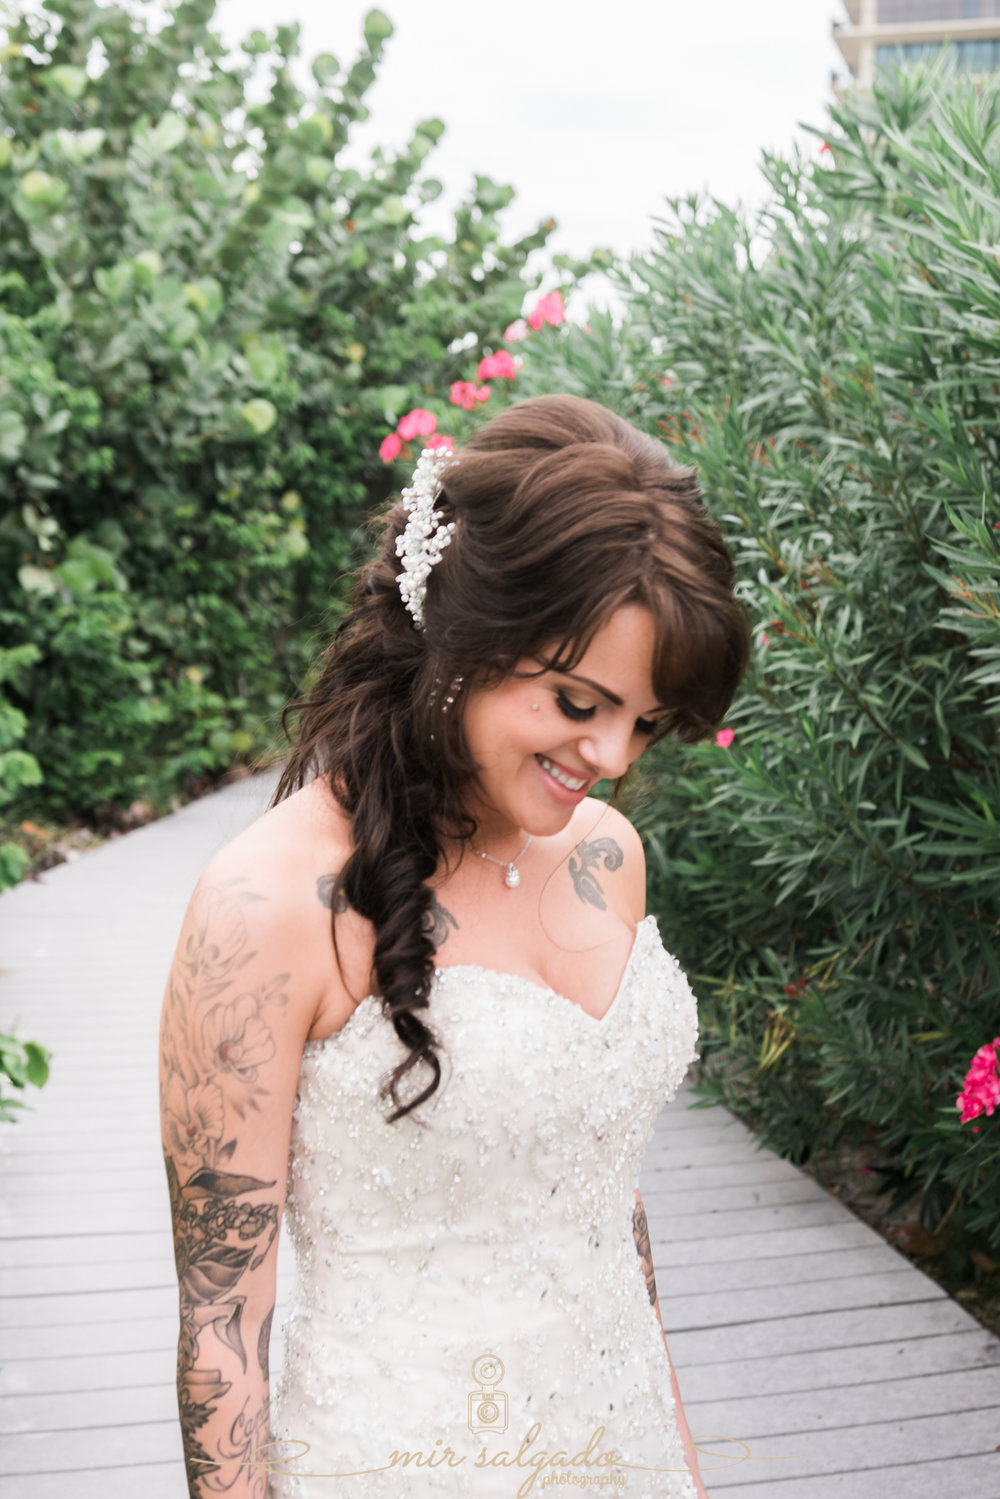 bride-wedding-photo, tide-the-knot-beach-weddings, St.Pete-wedding-photographer